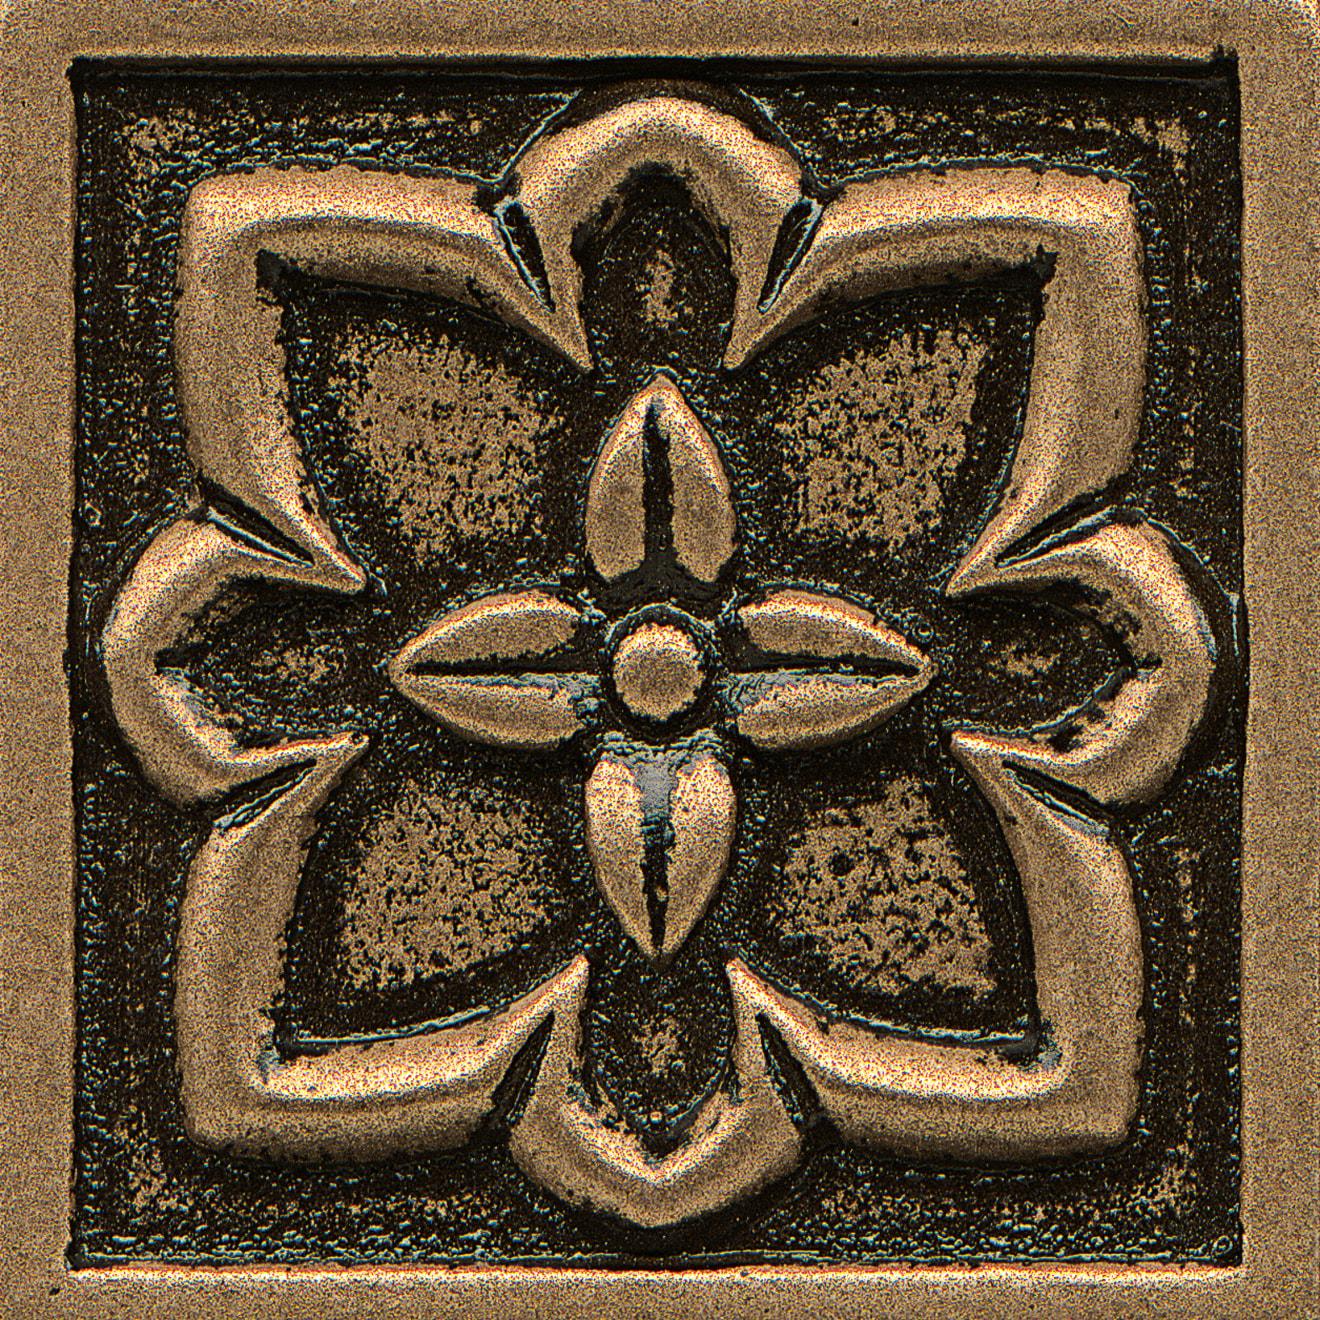 "Ambiance 2"" x 2"" Romanesque Metal Resin Insert in Bronze"